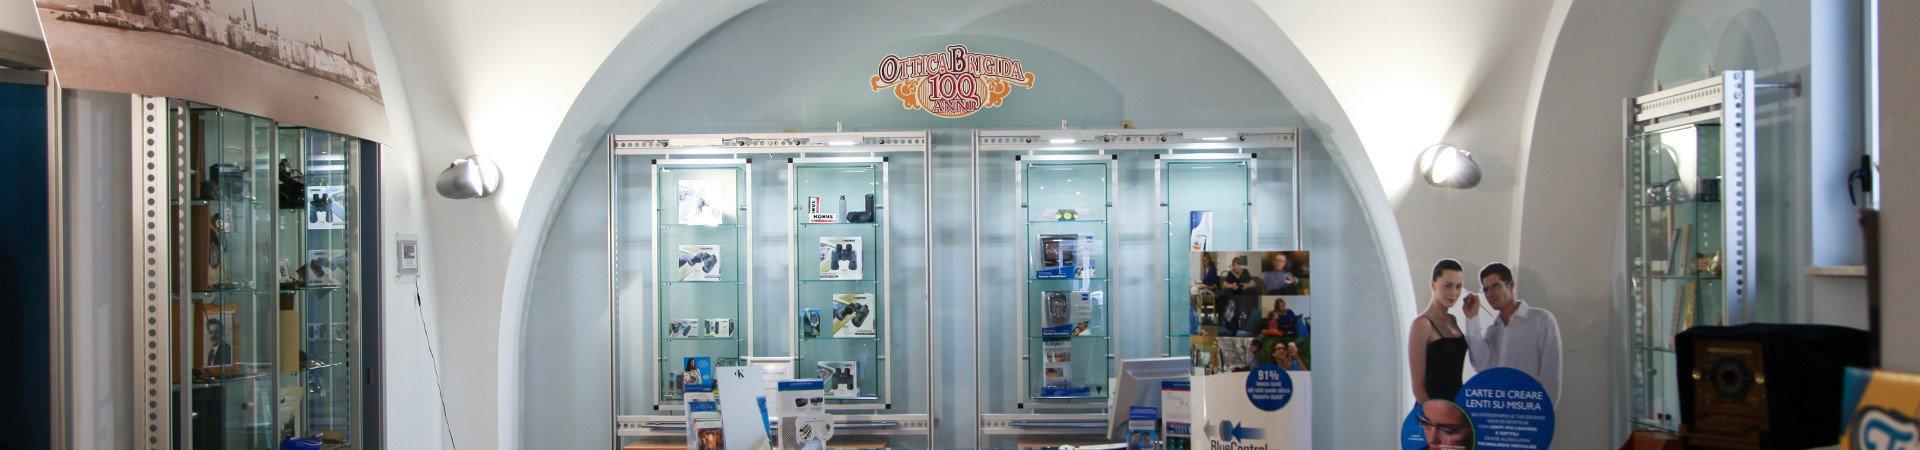 Shot from inside the Ottica Brigida store.